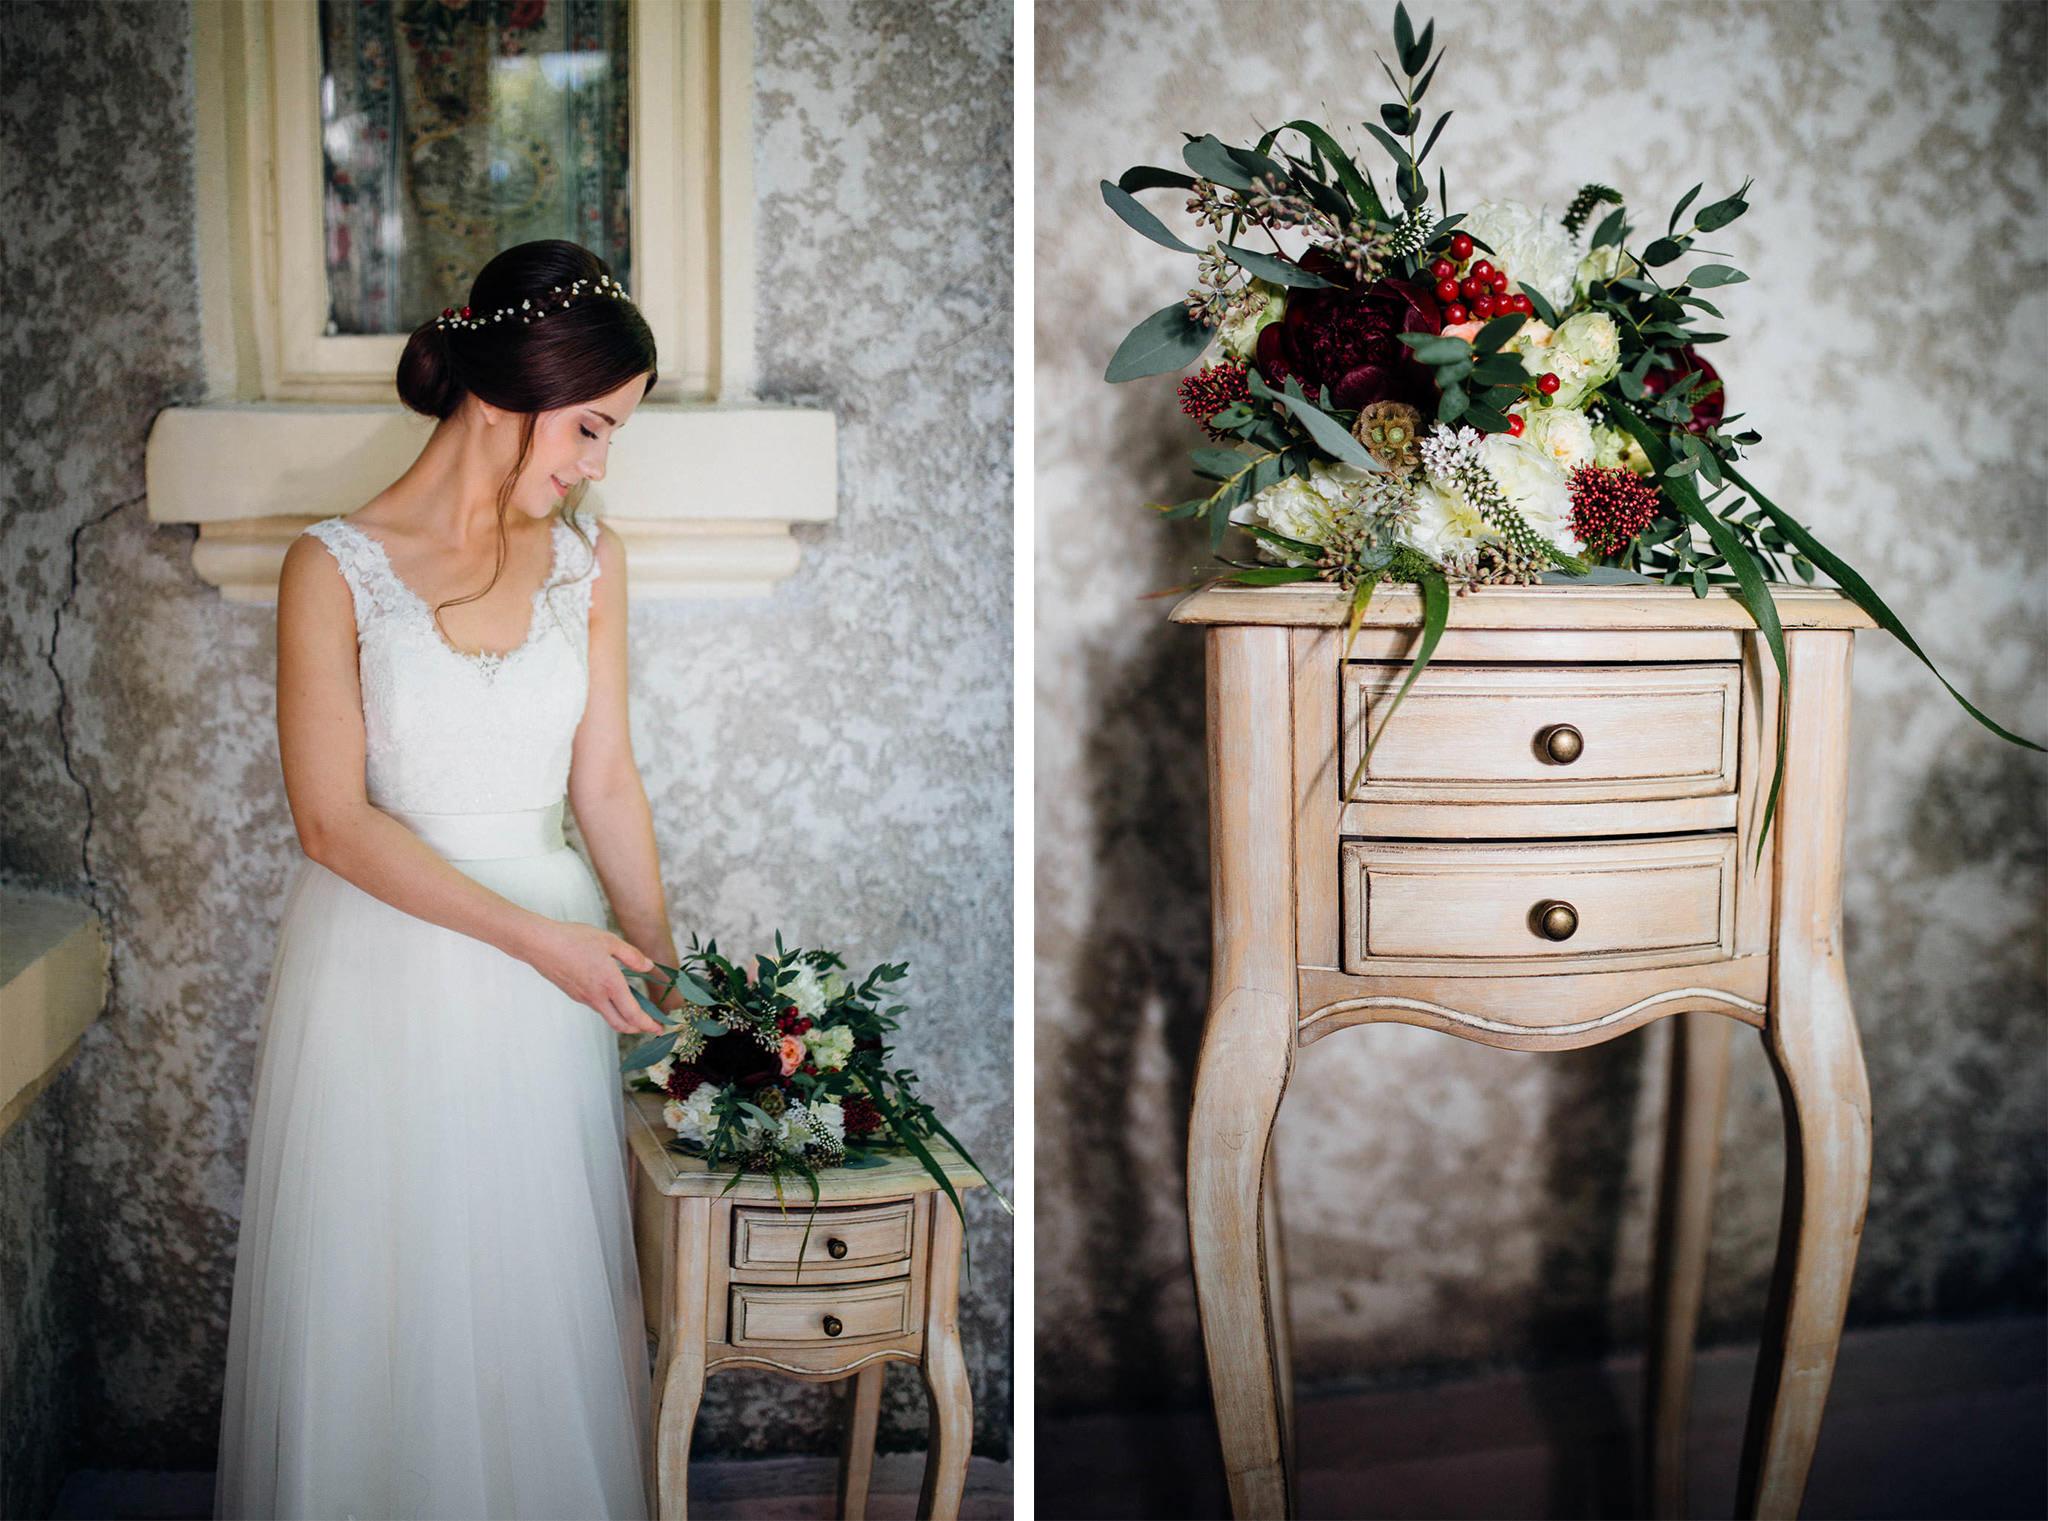 Beniamin-&-Ana-fotograf-nunta-vintage-Bucuresti-1080